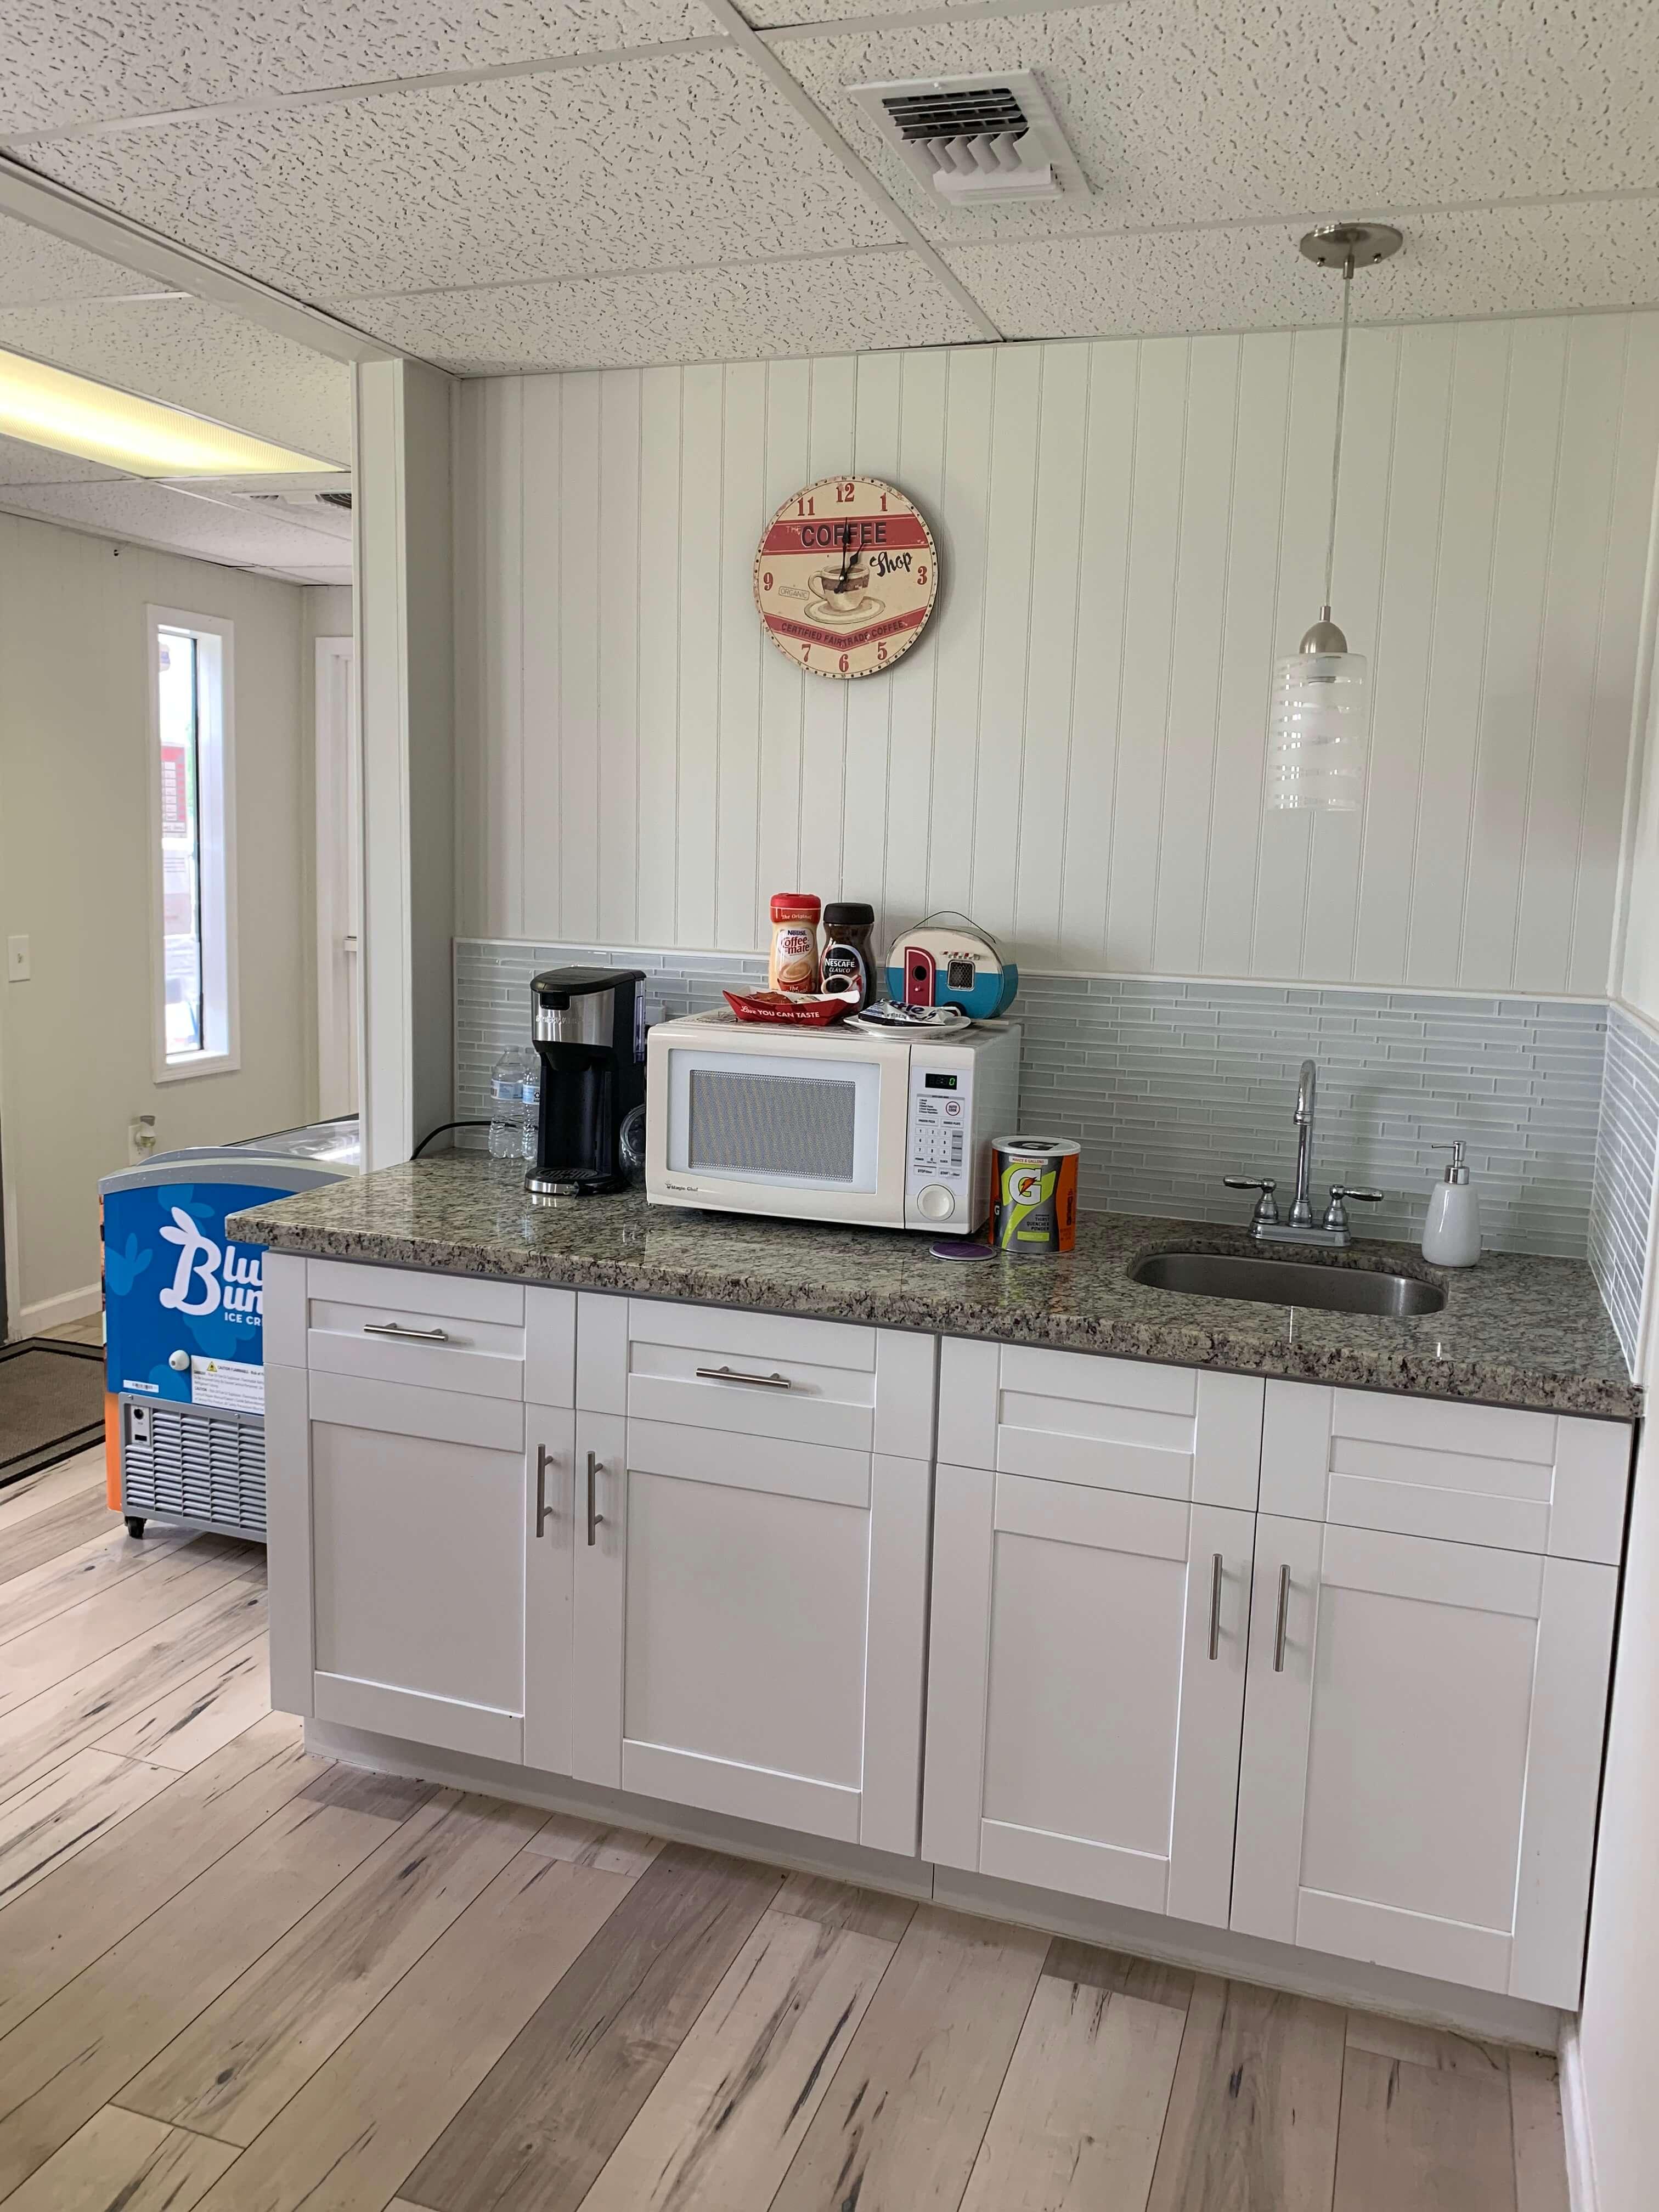 Sheldon Lake RV Resort Image Gallery 26